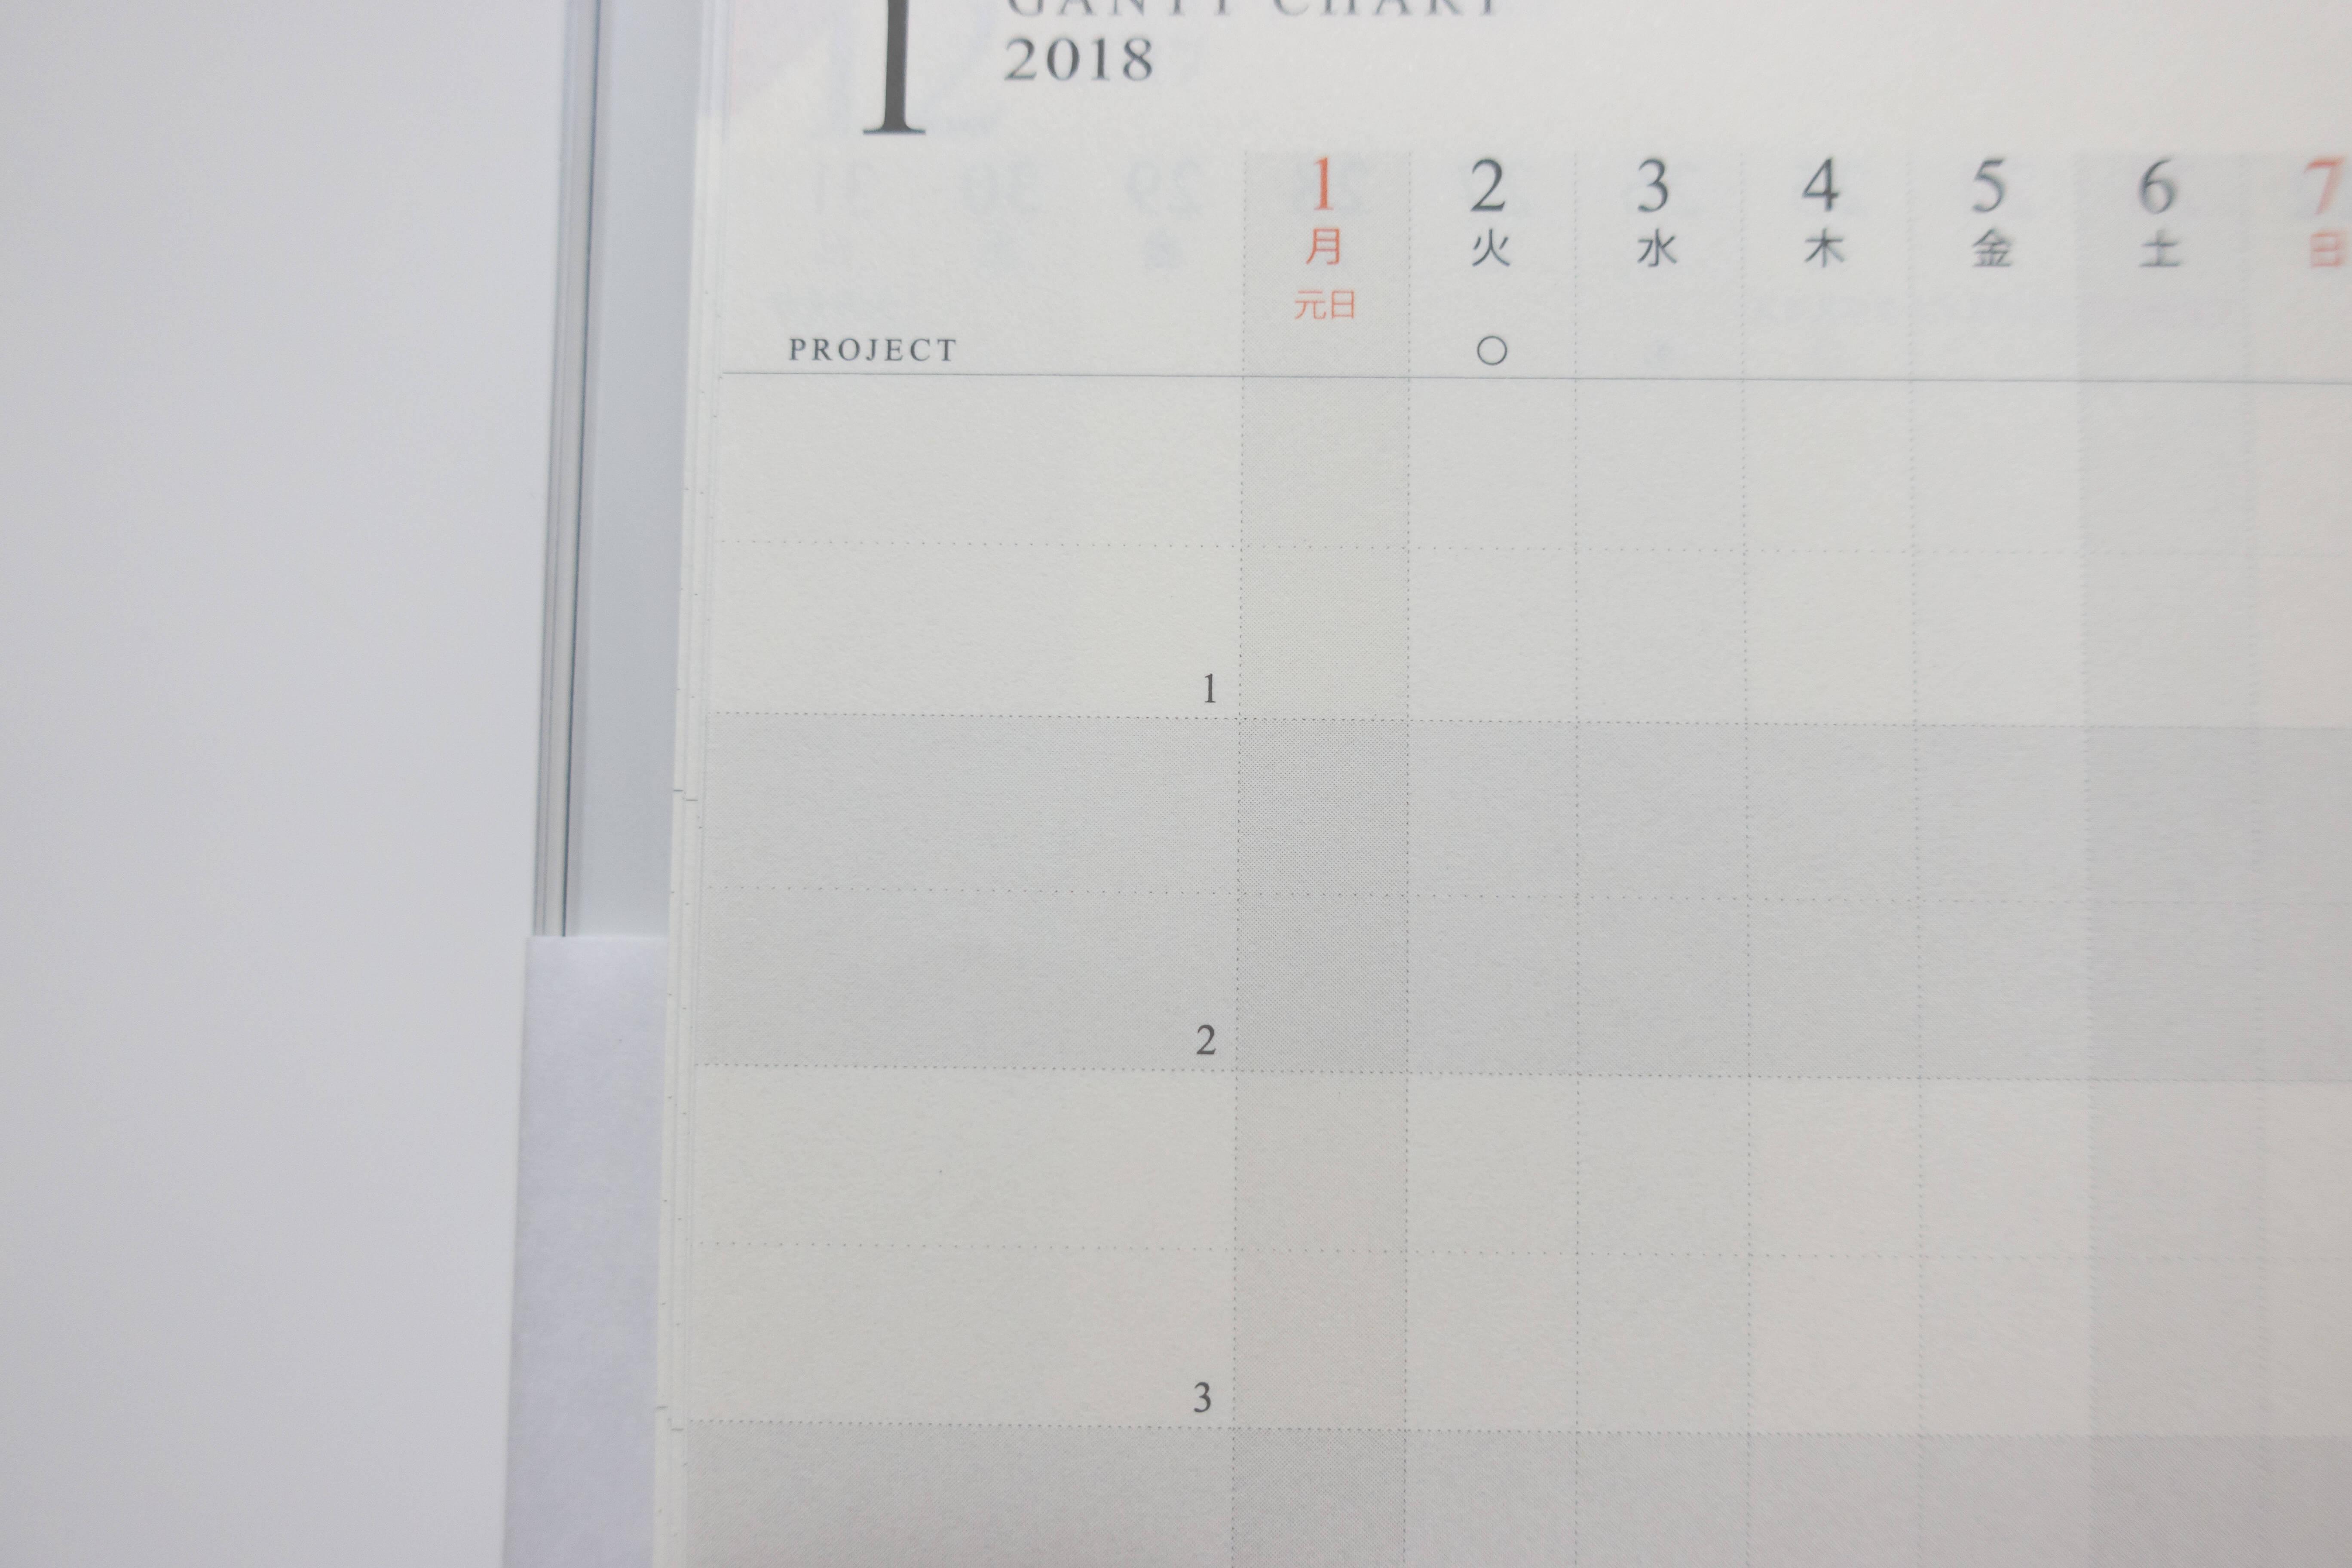 180107 gant chart diary 06